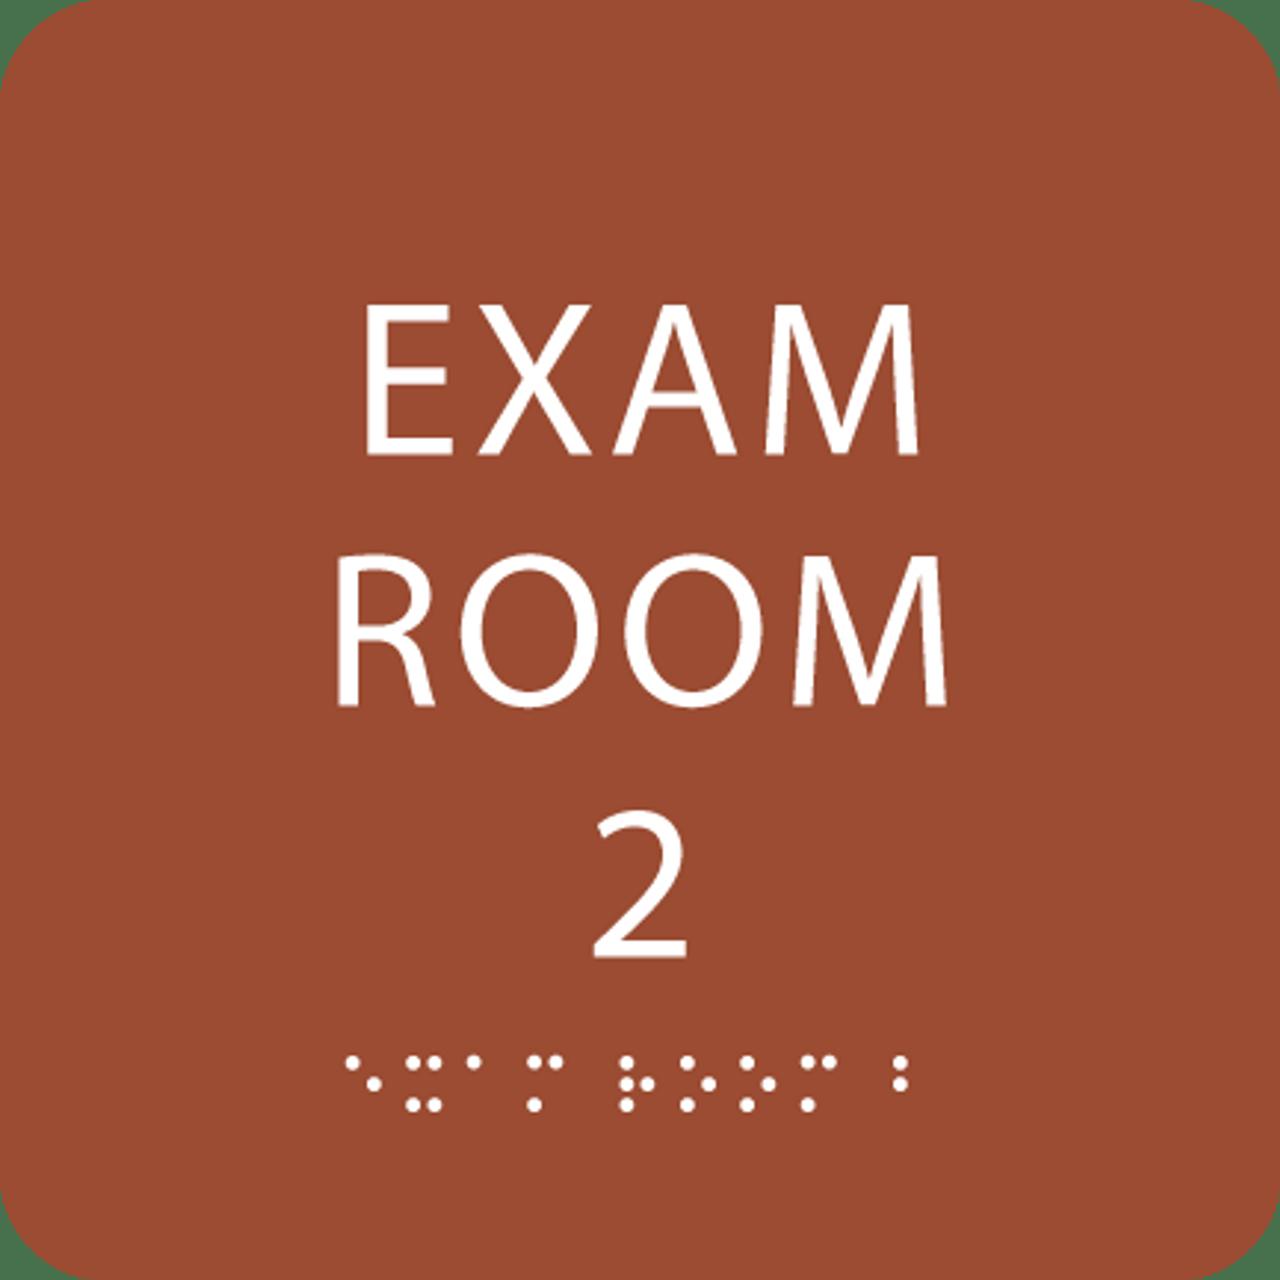 Orange ADA Exam Room 2 Sign with Braille